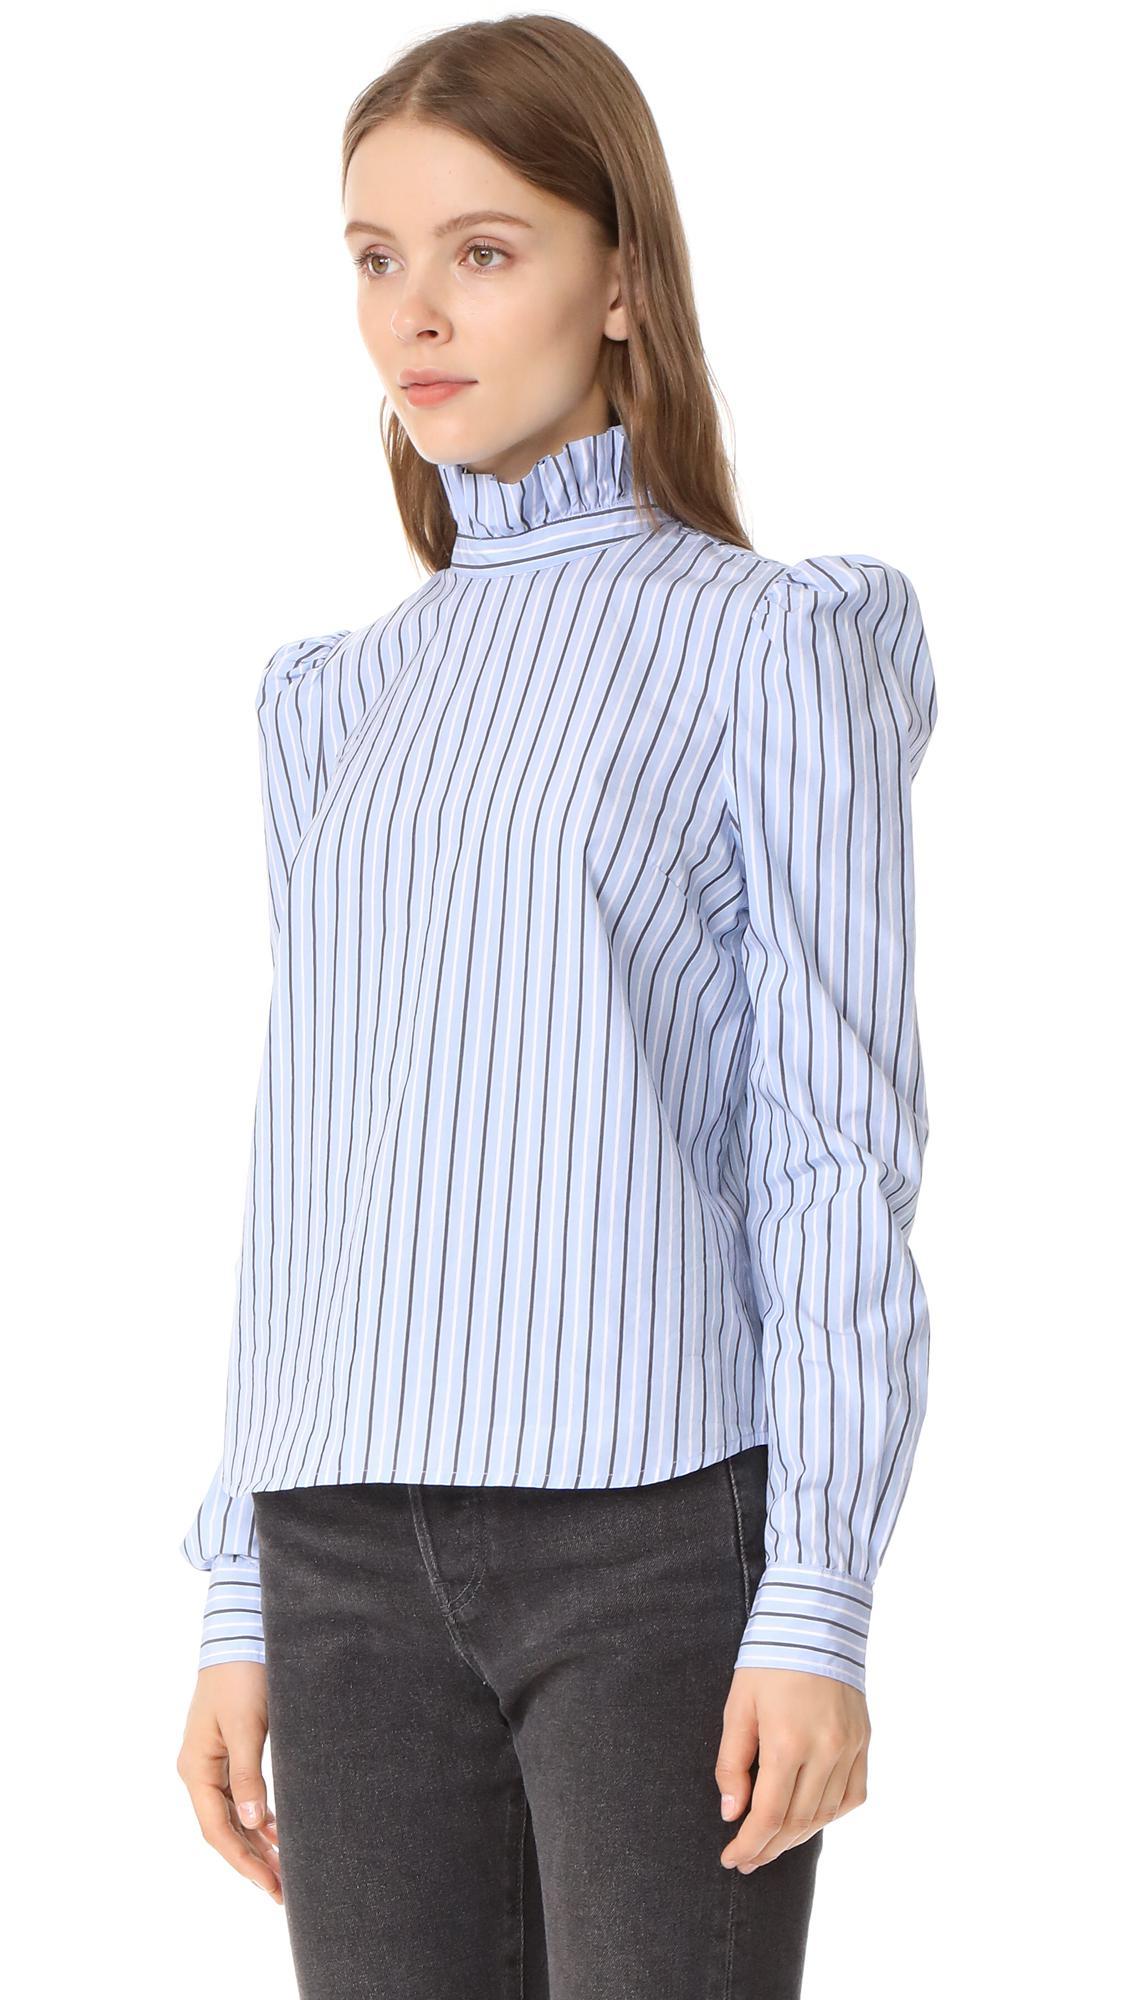 Men's XXL White Ruffled Gothic Shirt - Candy Apple ... |Ruffle Shirt